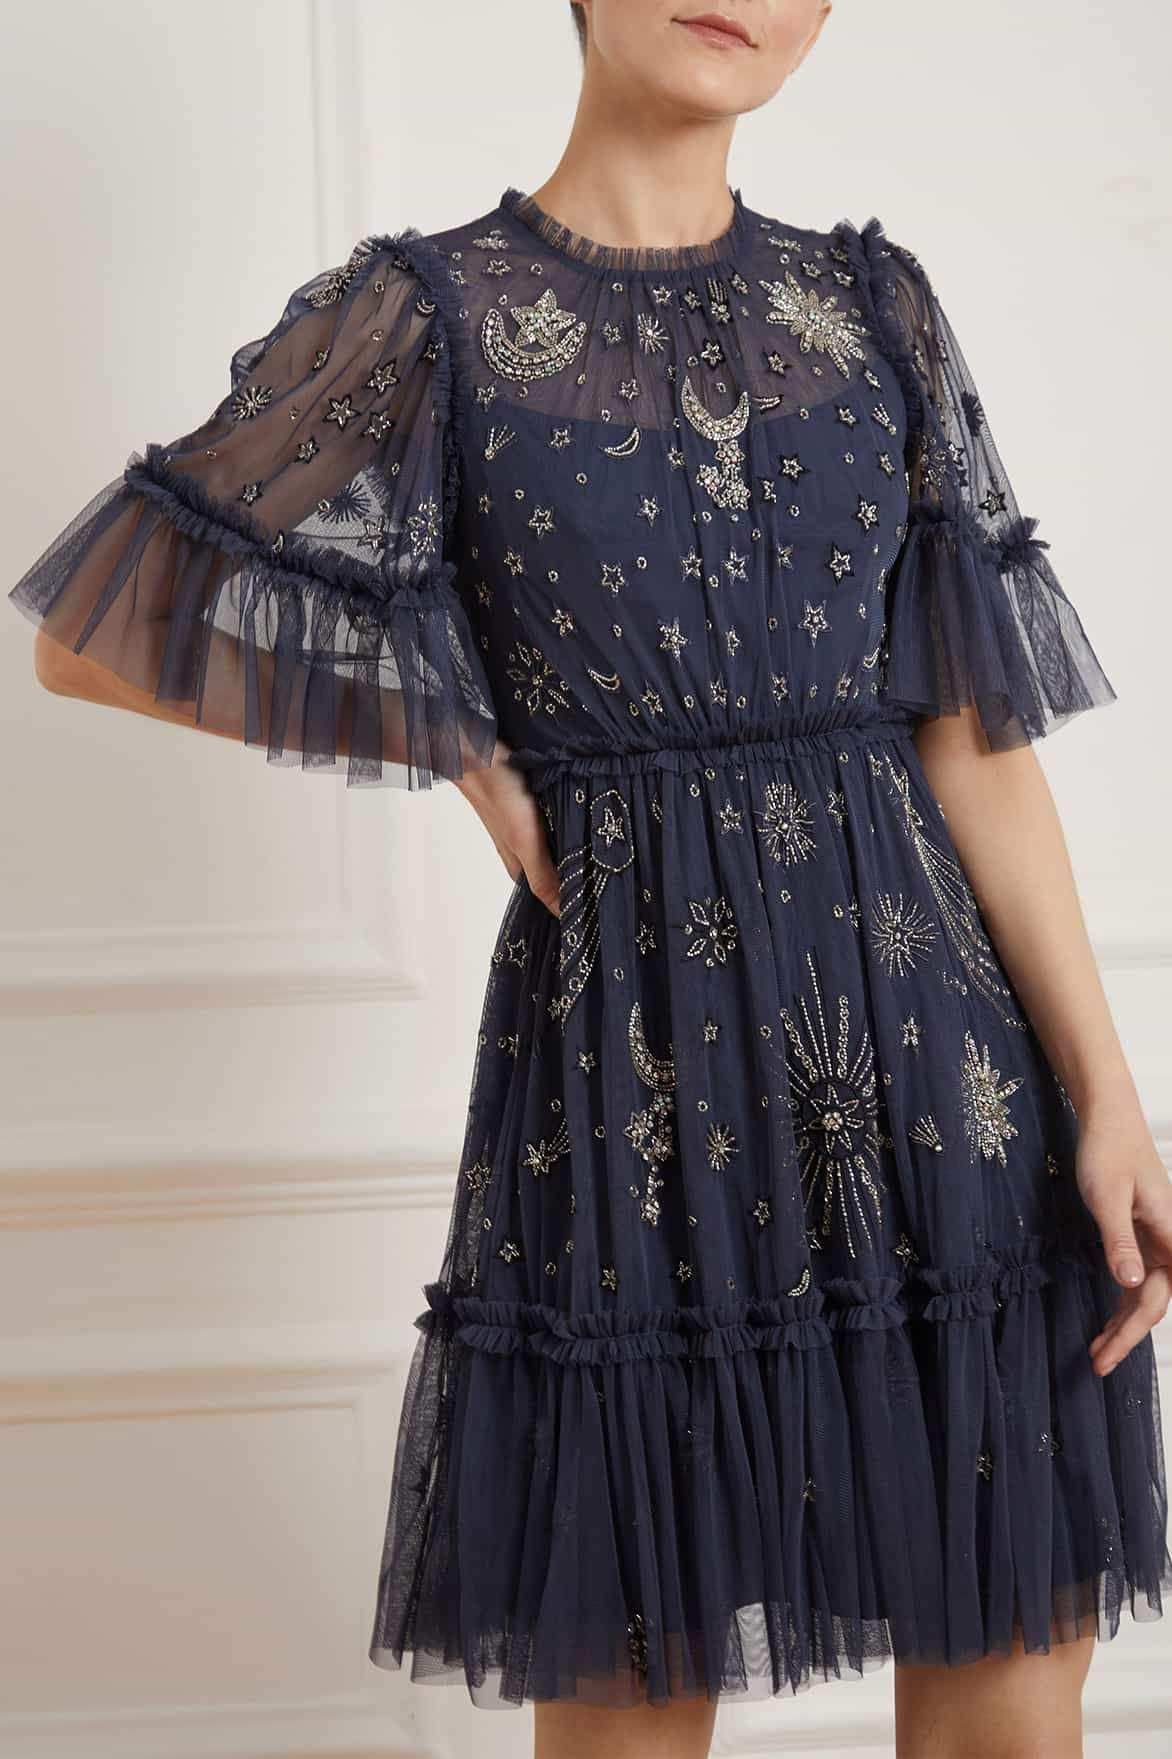 HS20 New Season Ether Mini Dress in Midnight Blue